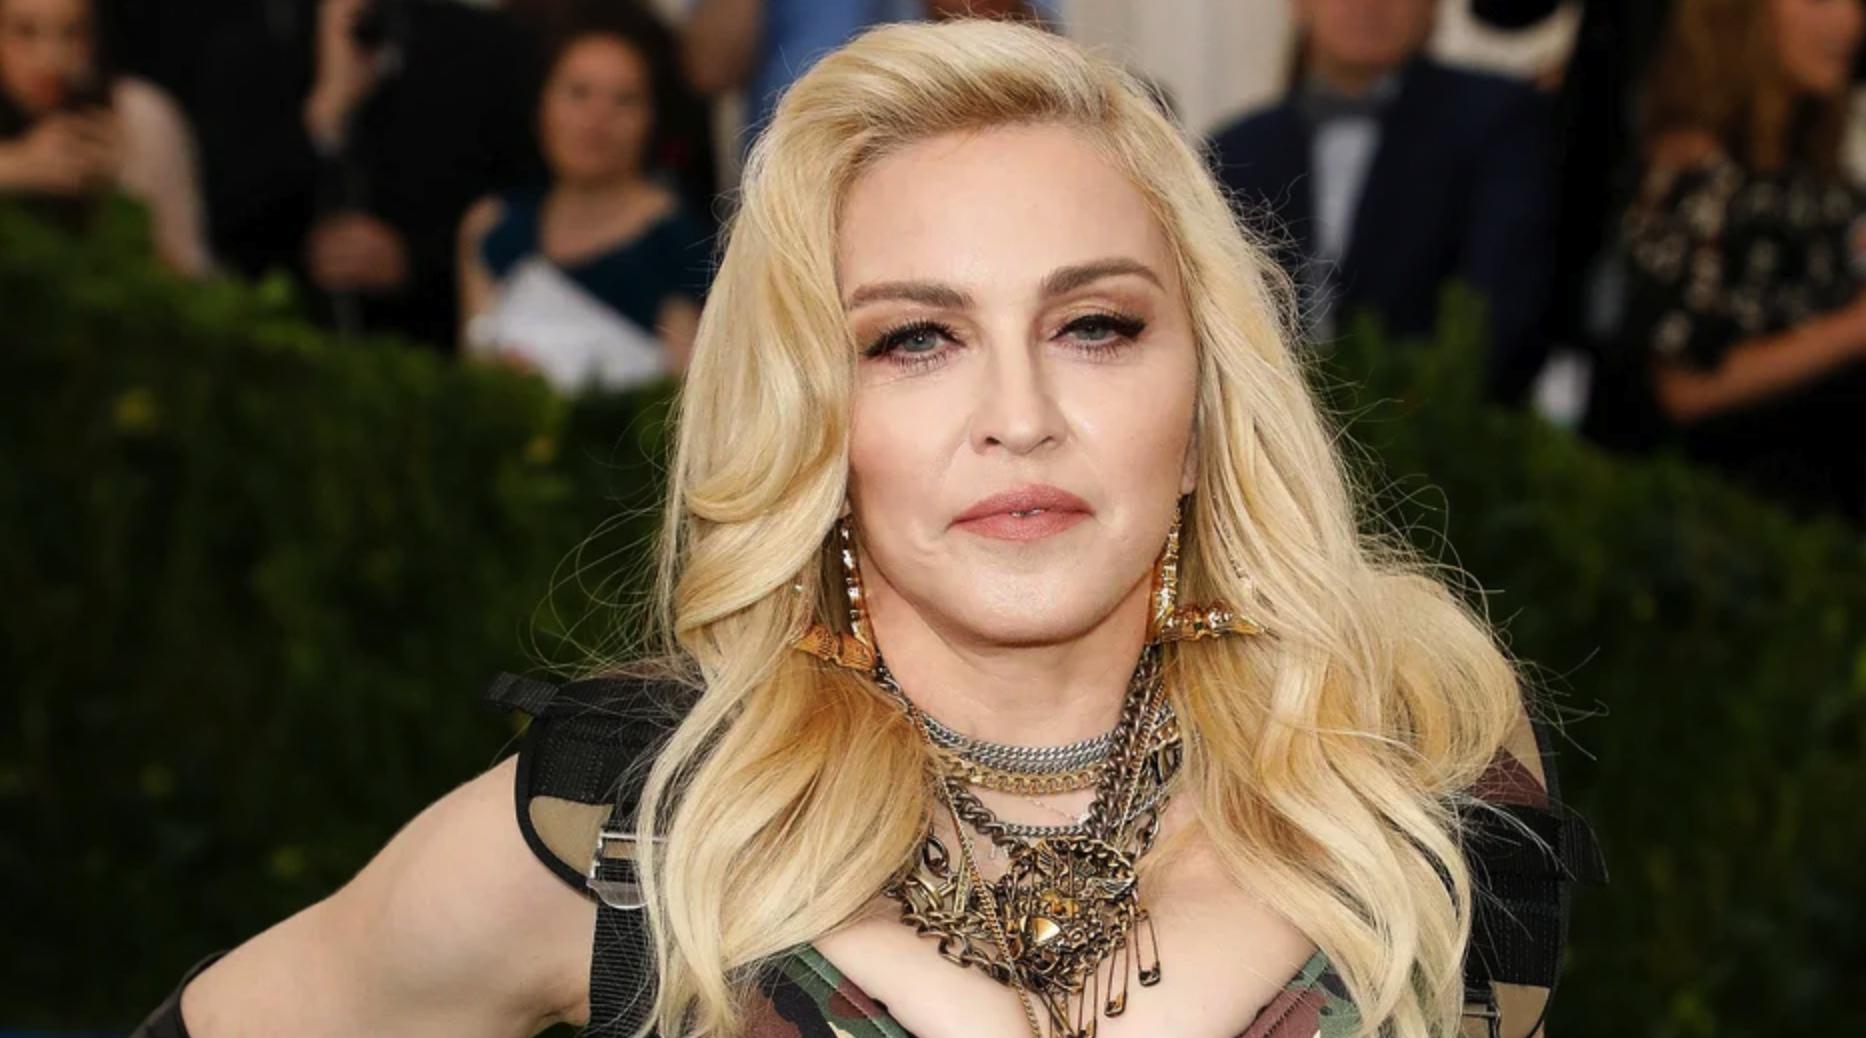 Madonna promoting crypto